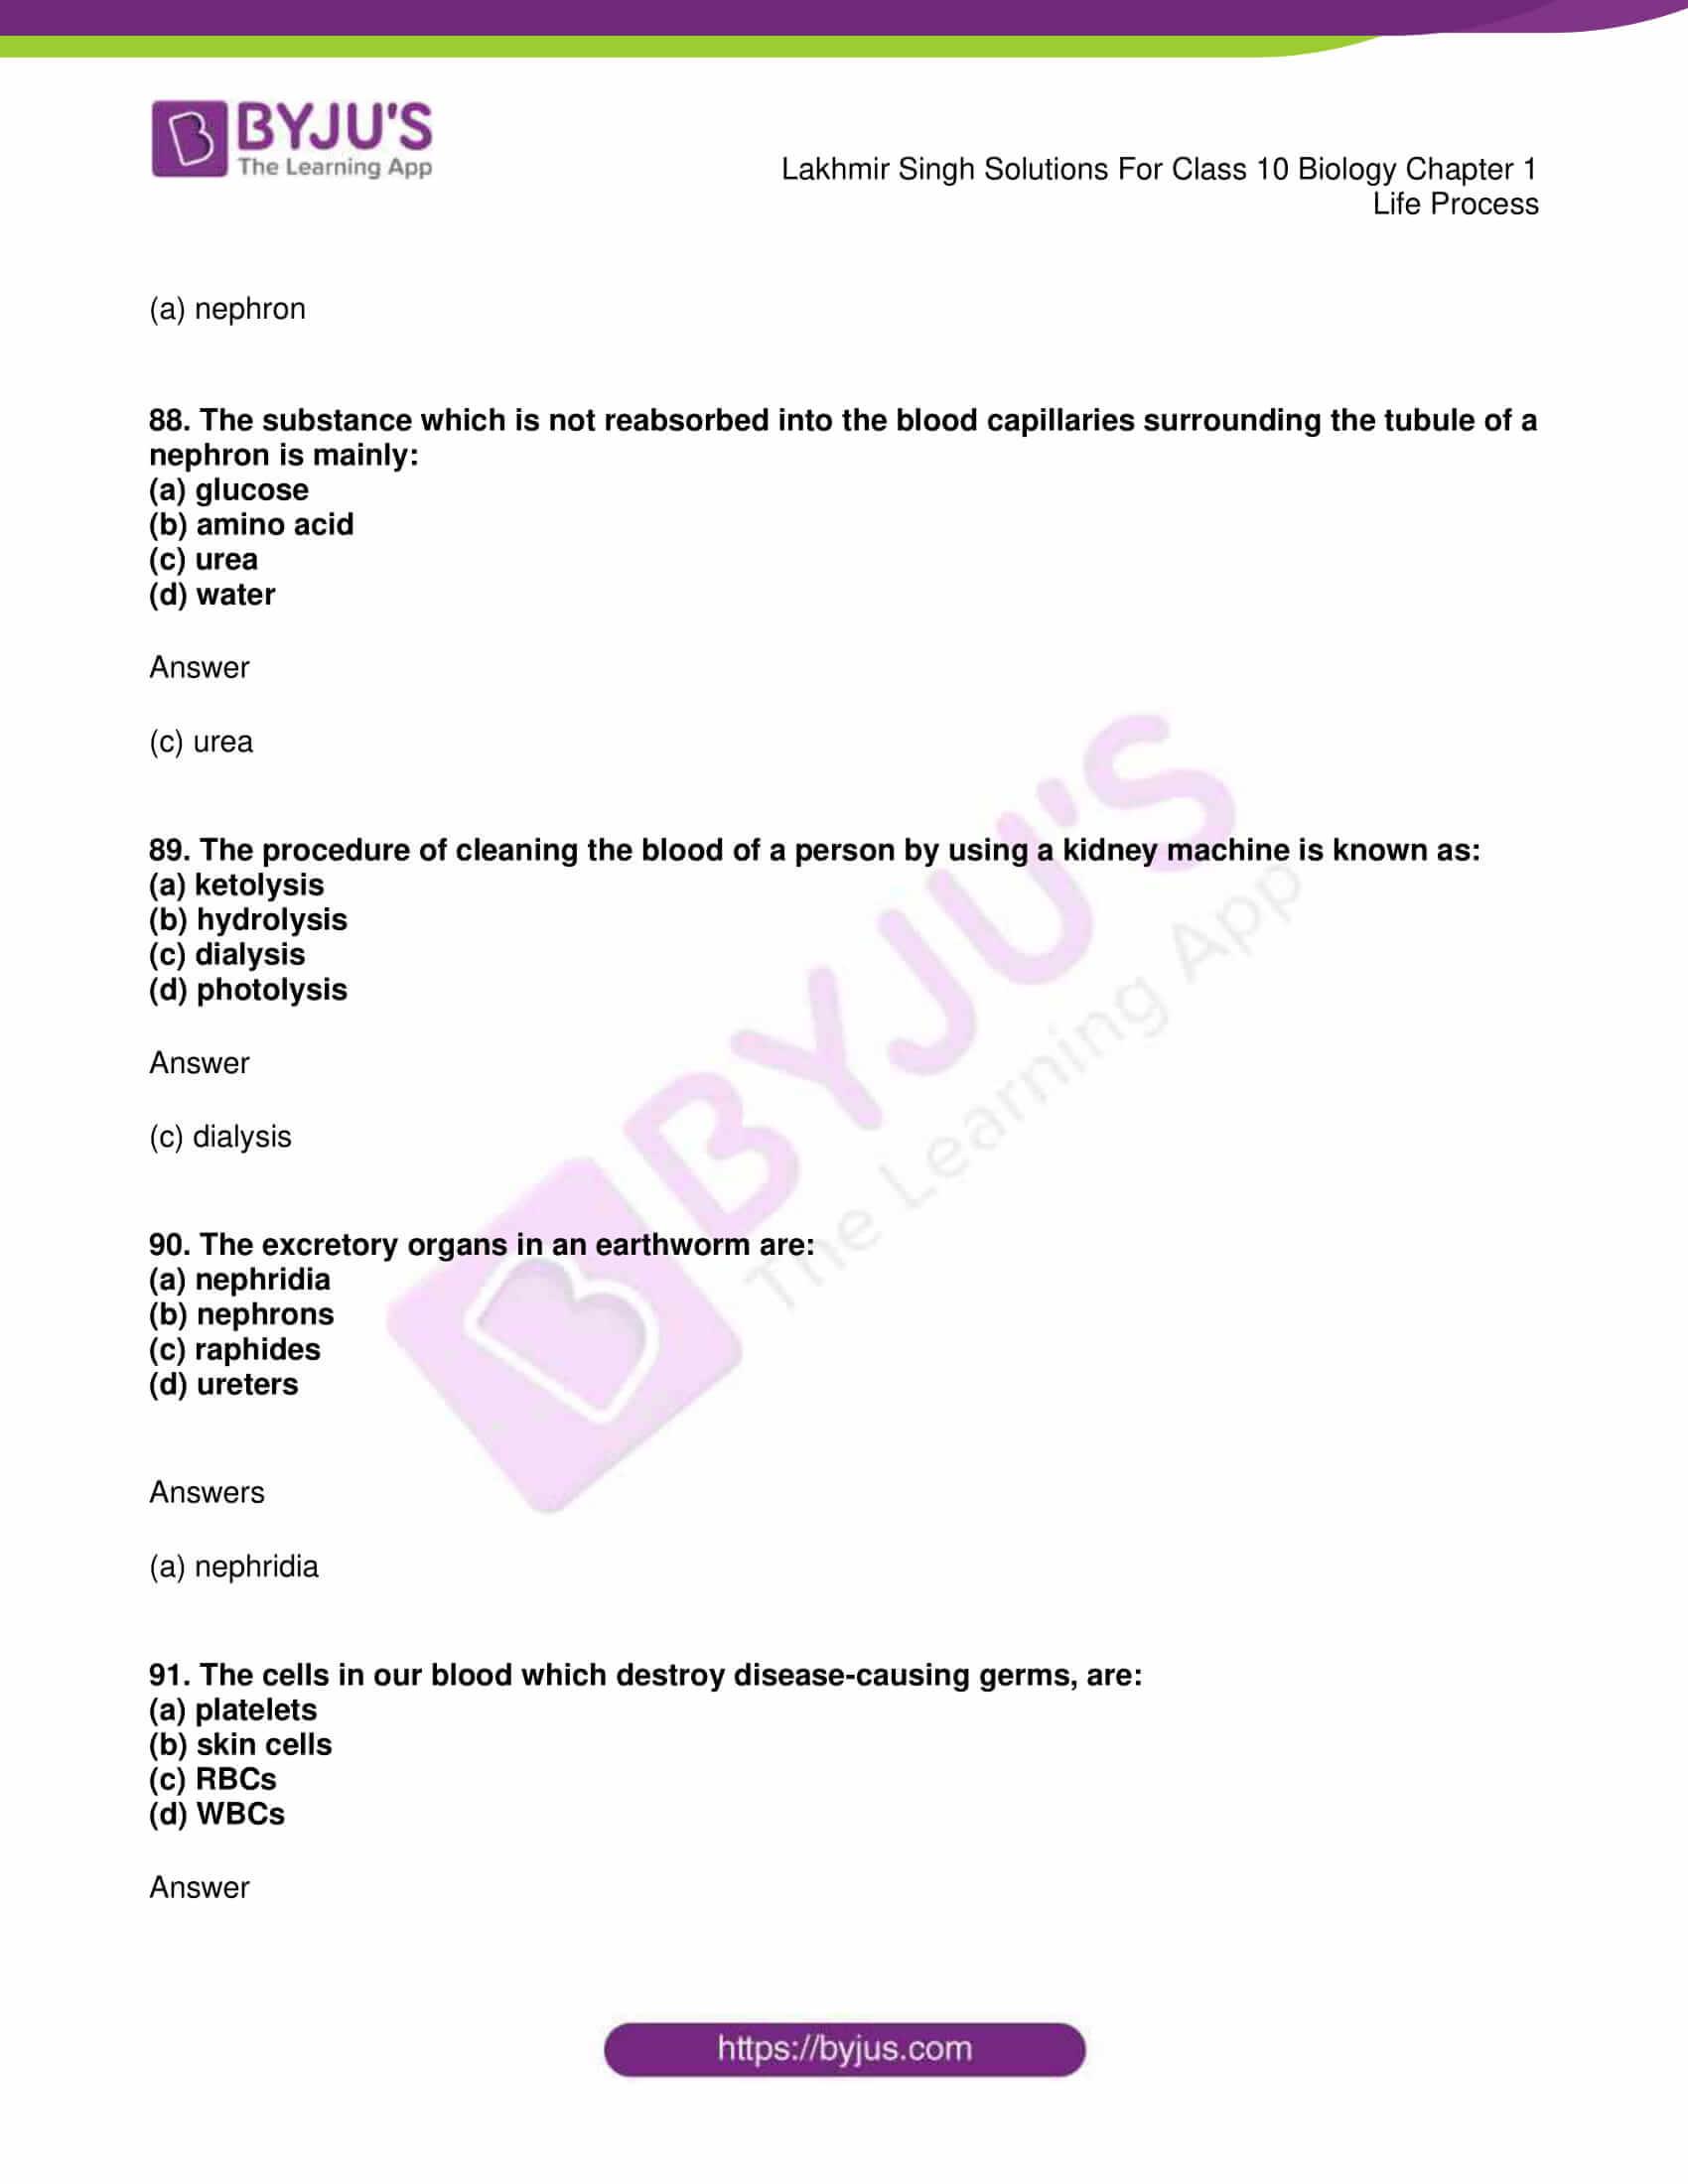 lakhmir singh sol class 10 biology chapter 1 88